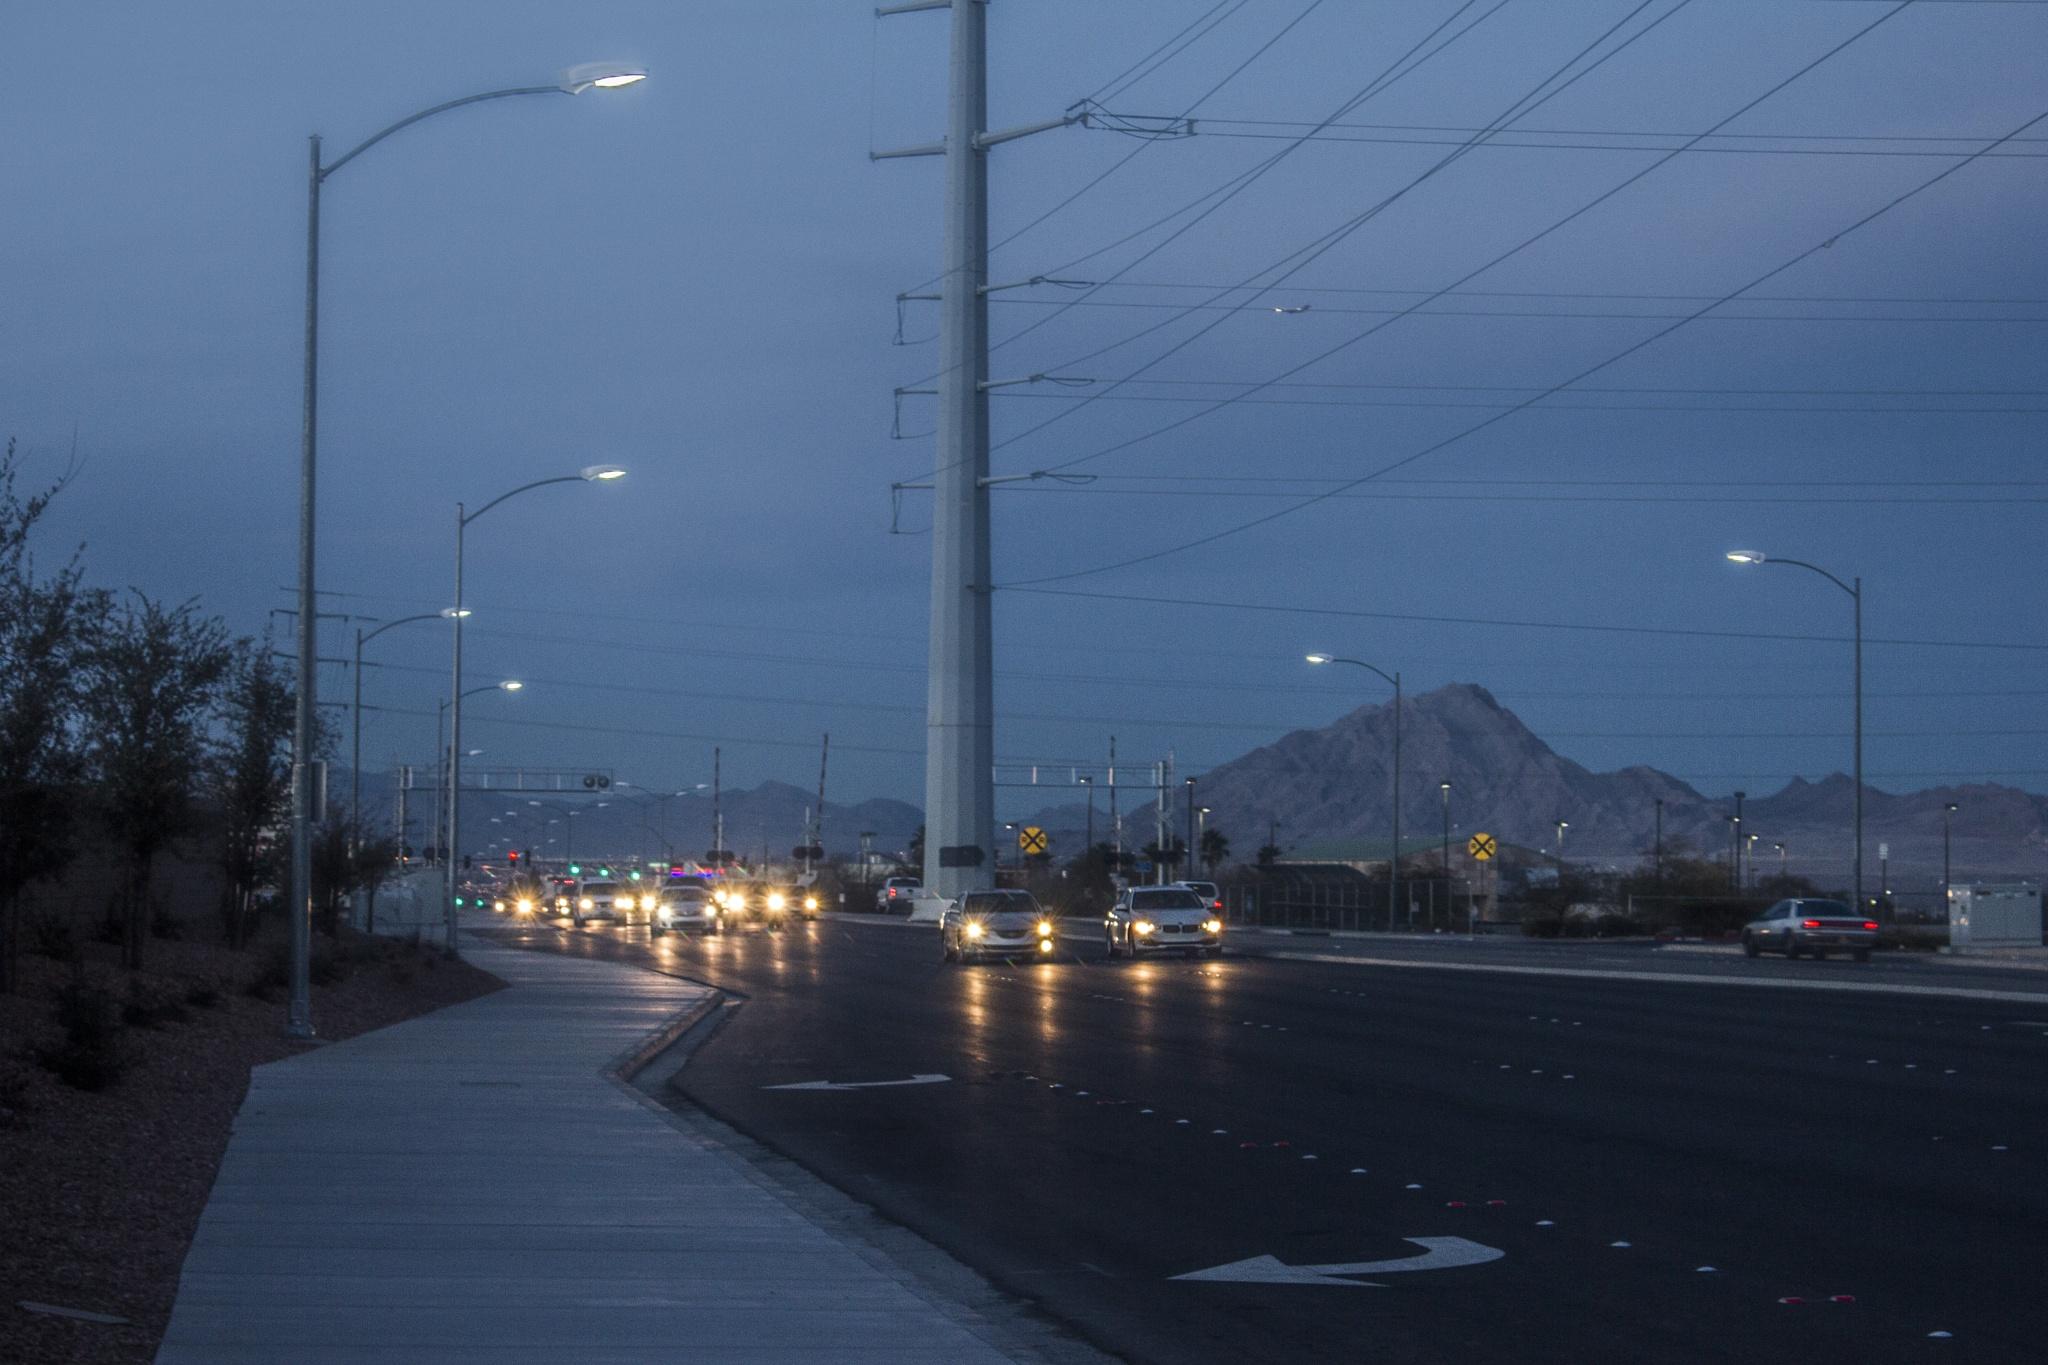 lighting the way by edwardpalmquist